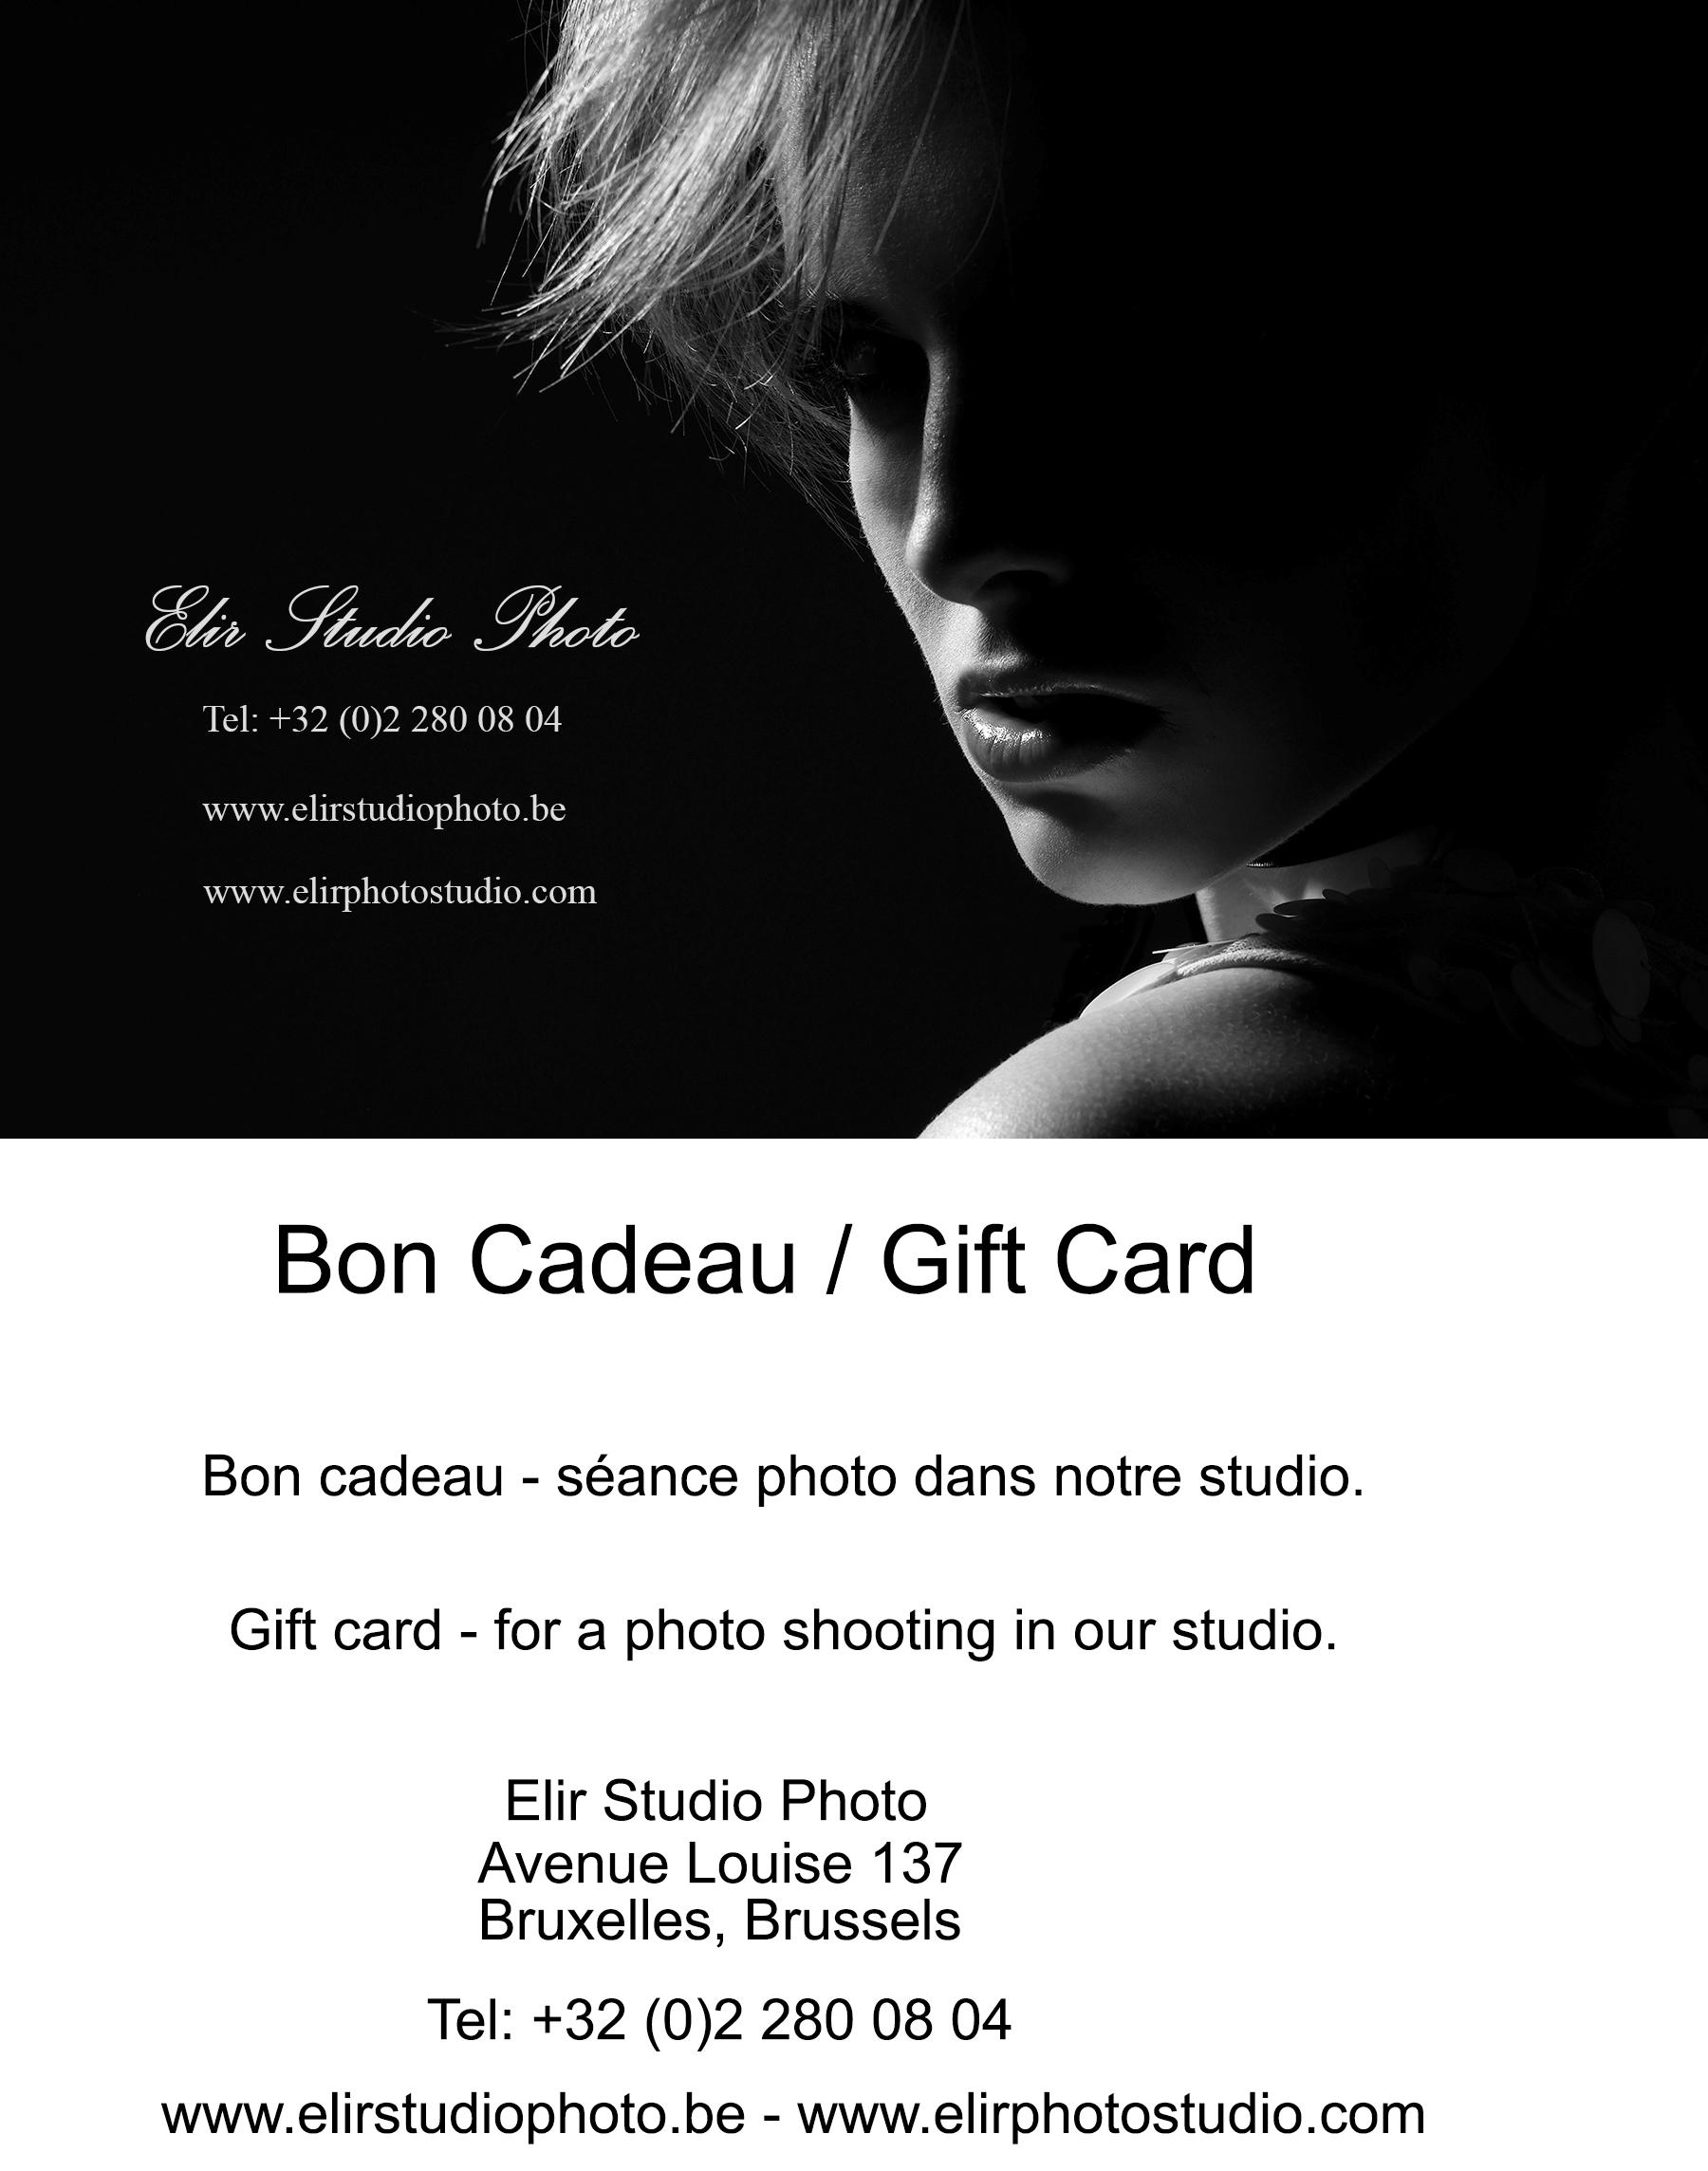 Bon cadeau_Gift card_Elir Studio Photo_Bruxelles_Brussels.jpg